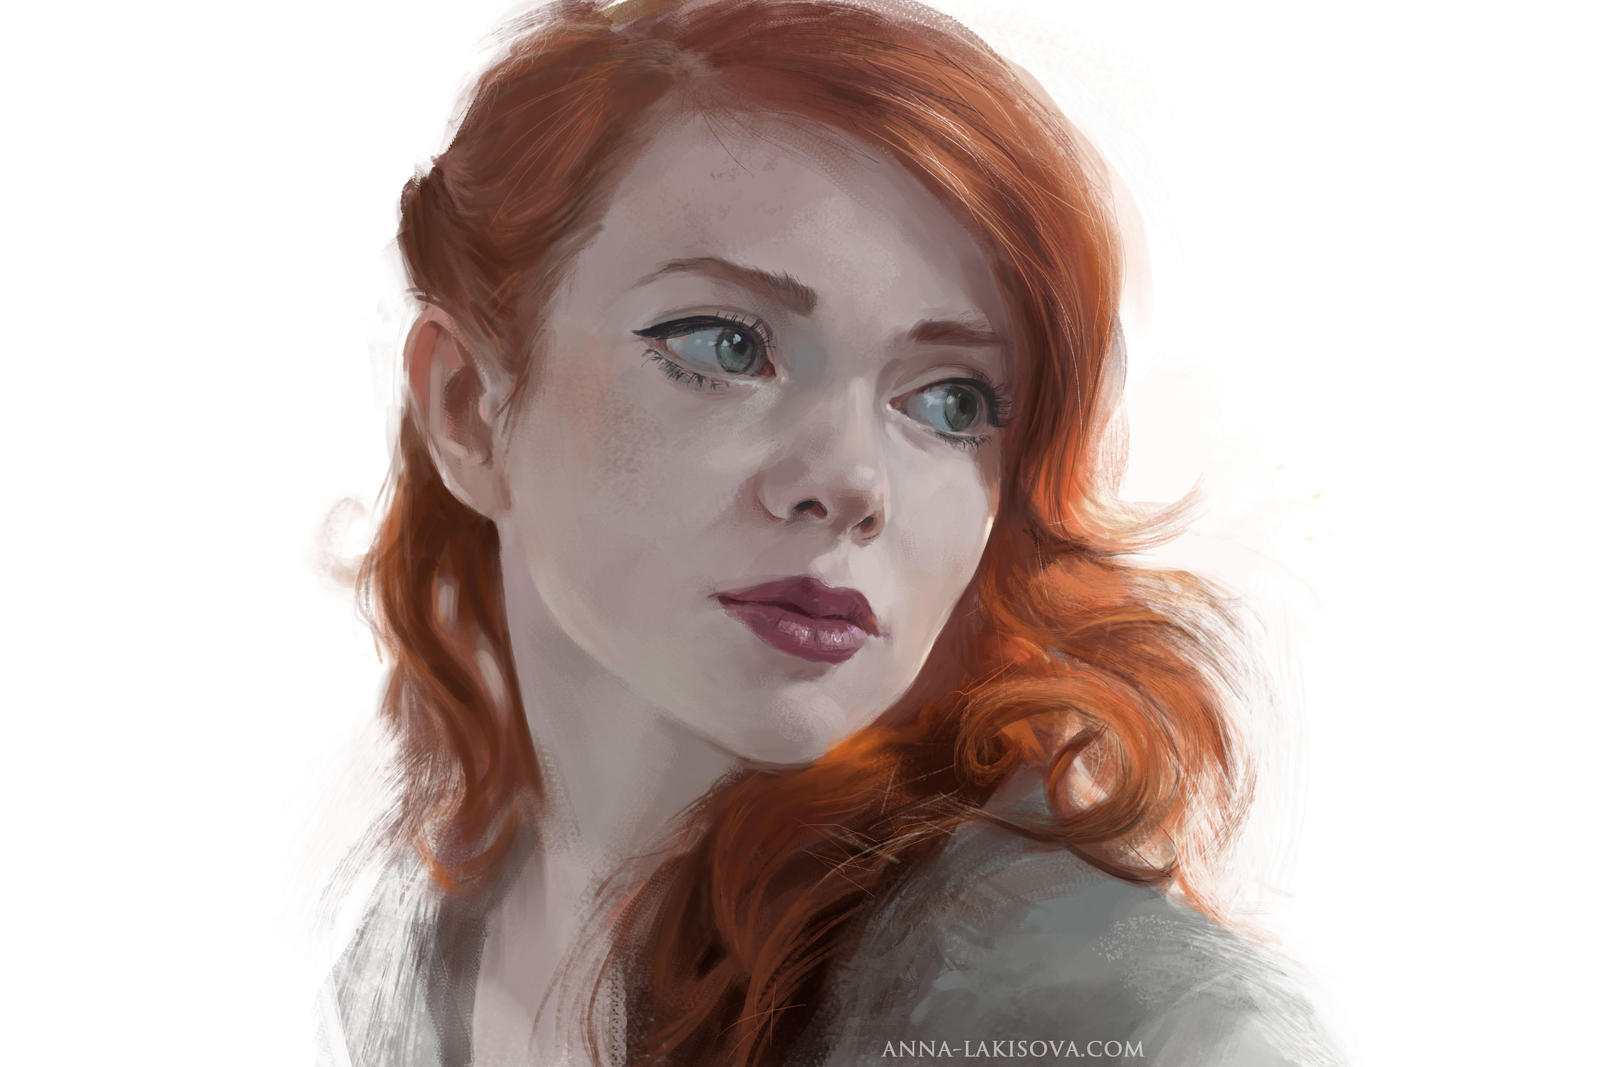 redhead by zvepywka